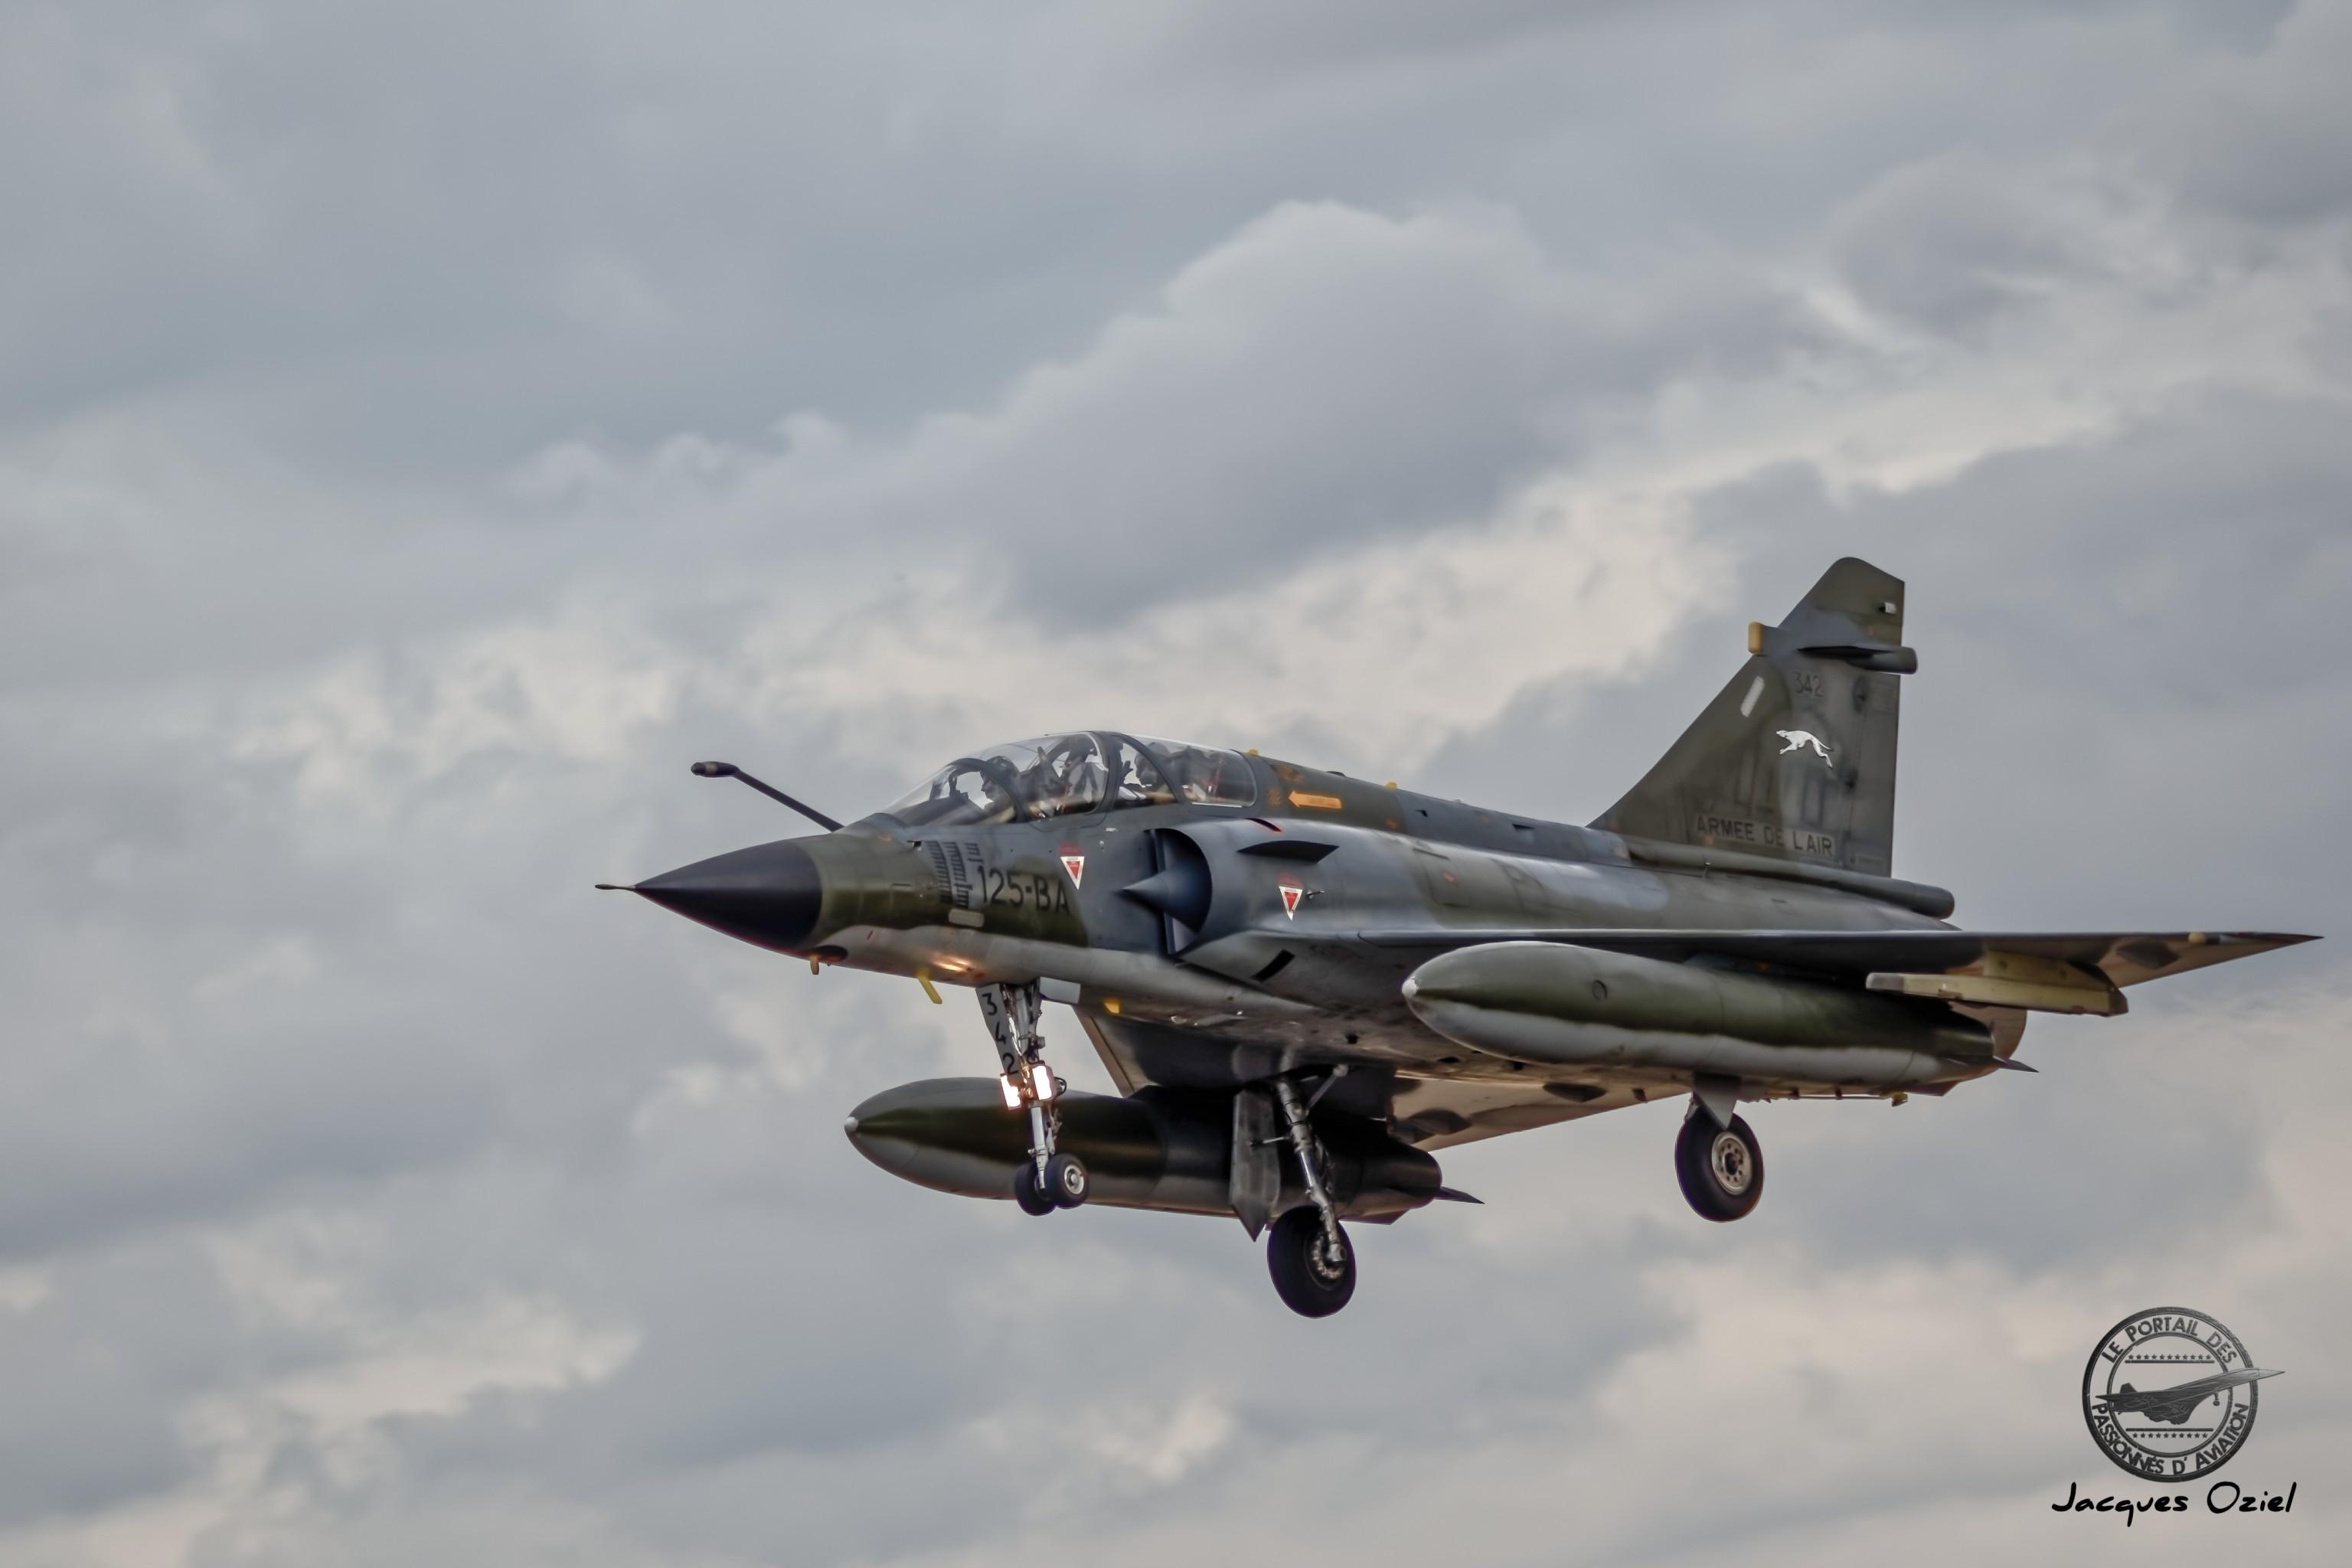 Dassault-Breguet Mirage 2000 N - 342/125-BA - France/EC 2/4 La Fayette